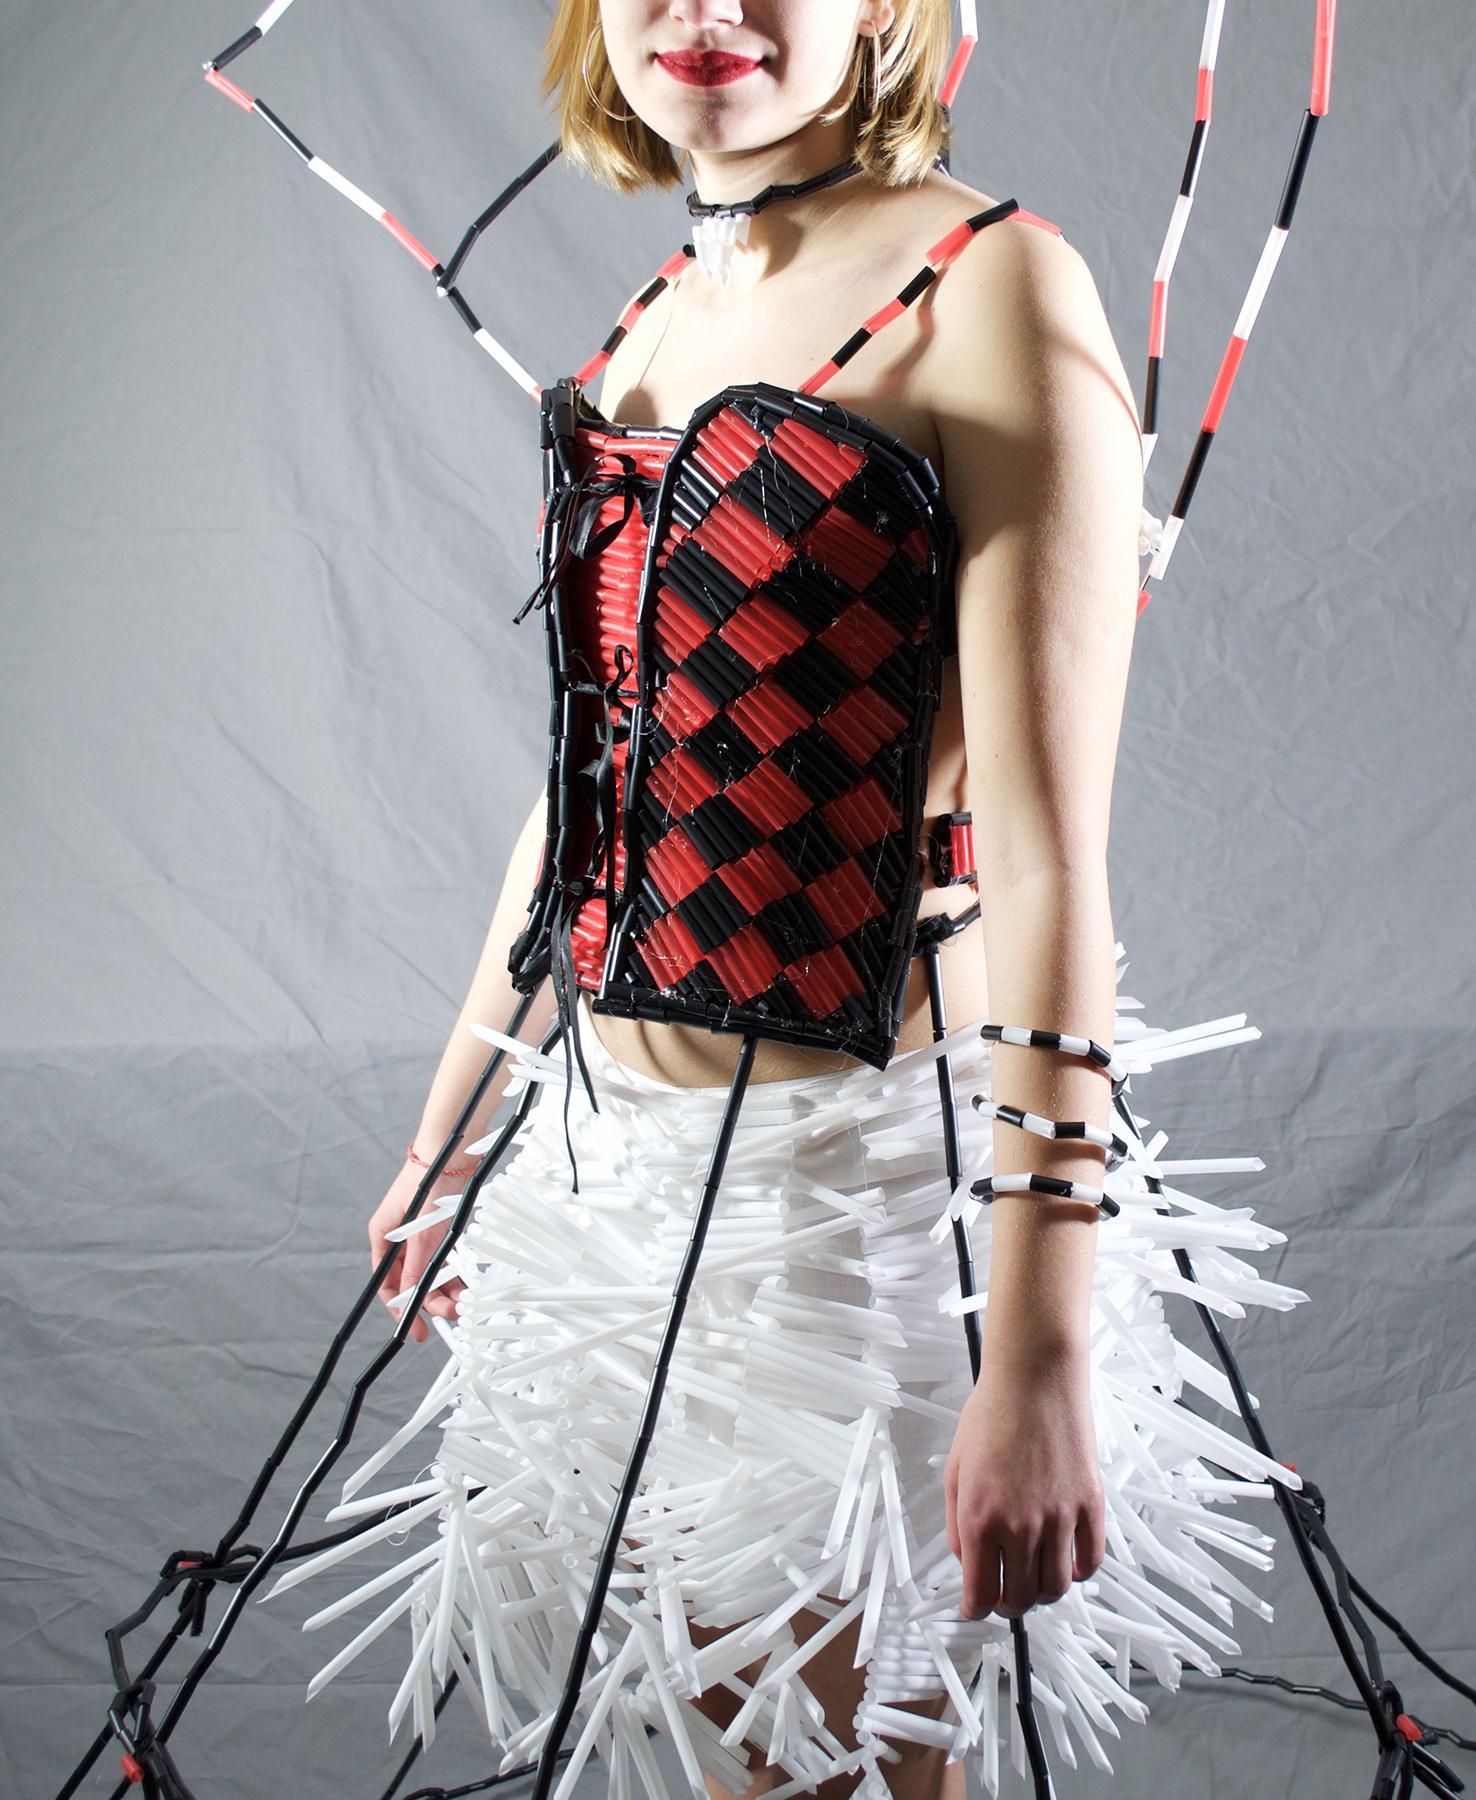 Sophie-straw transformation.jpg